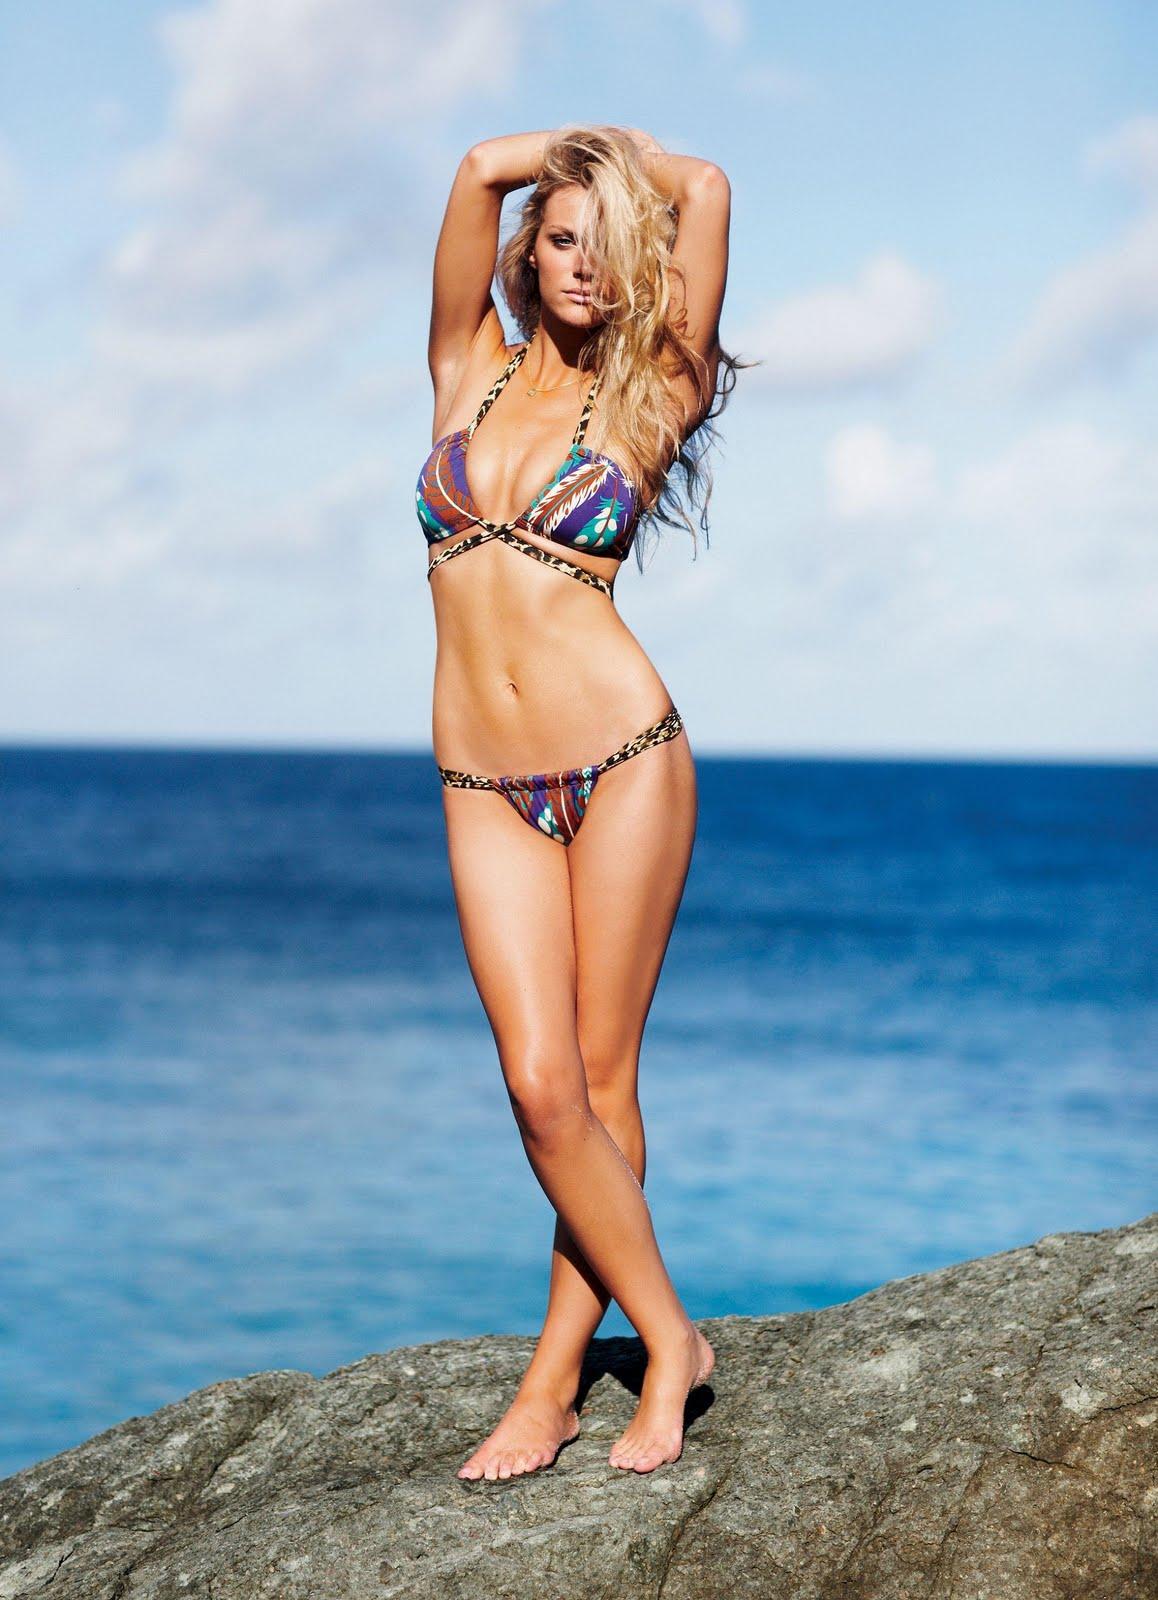 http://1.bp.blogspot.com/_zENnZobKPqM/S3ekEruVZYI/AAAAAAAACLU/s3TQj_5qVxY/s1600/Brooklyn_Decker__Victoria's_Secret_Swimsuit_2010.JPG